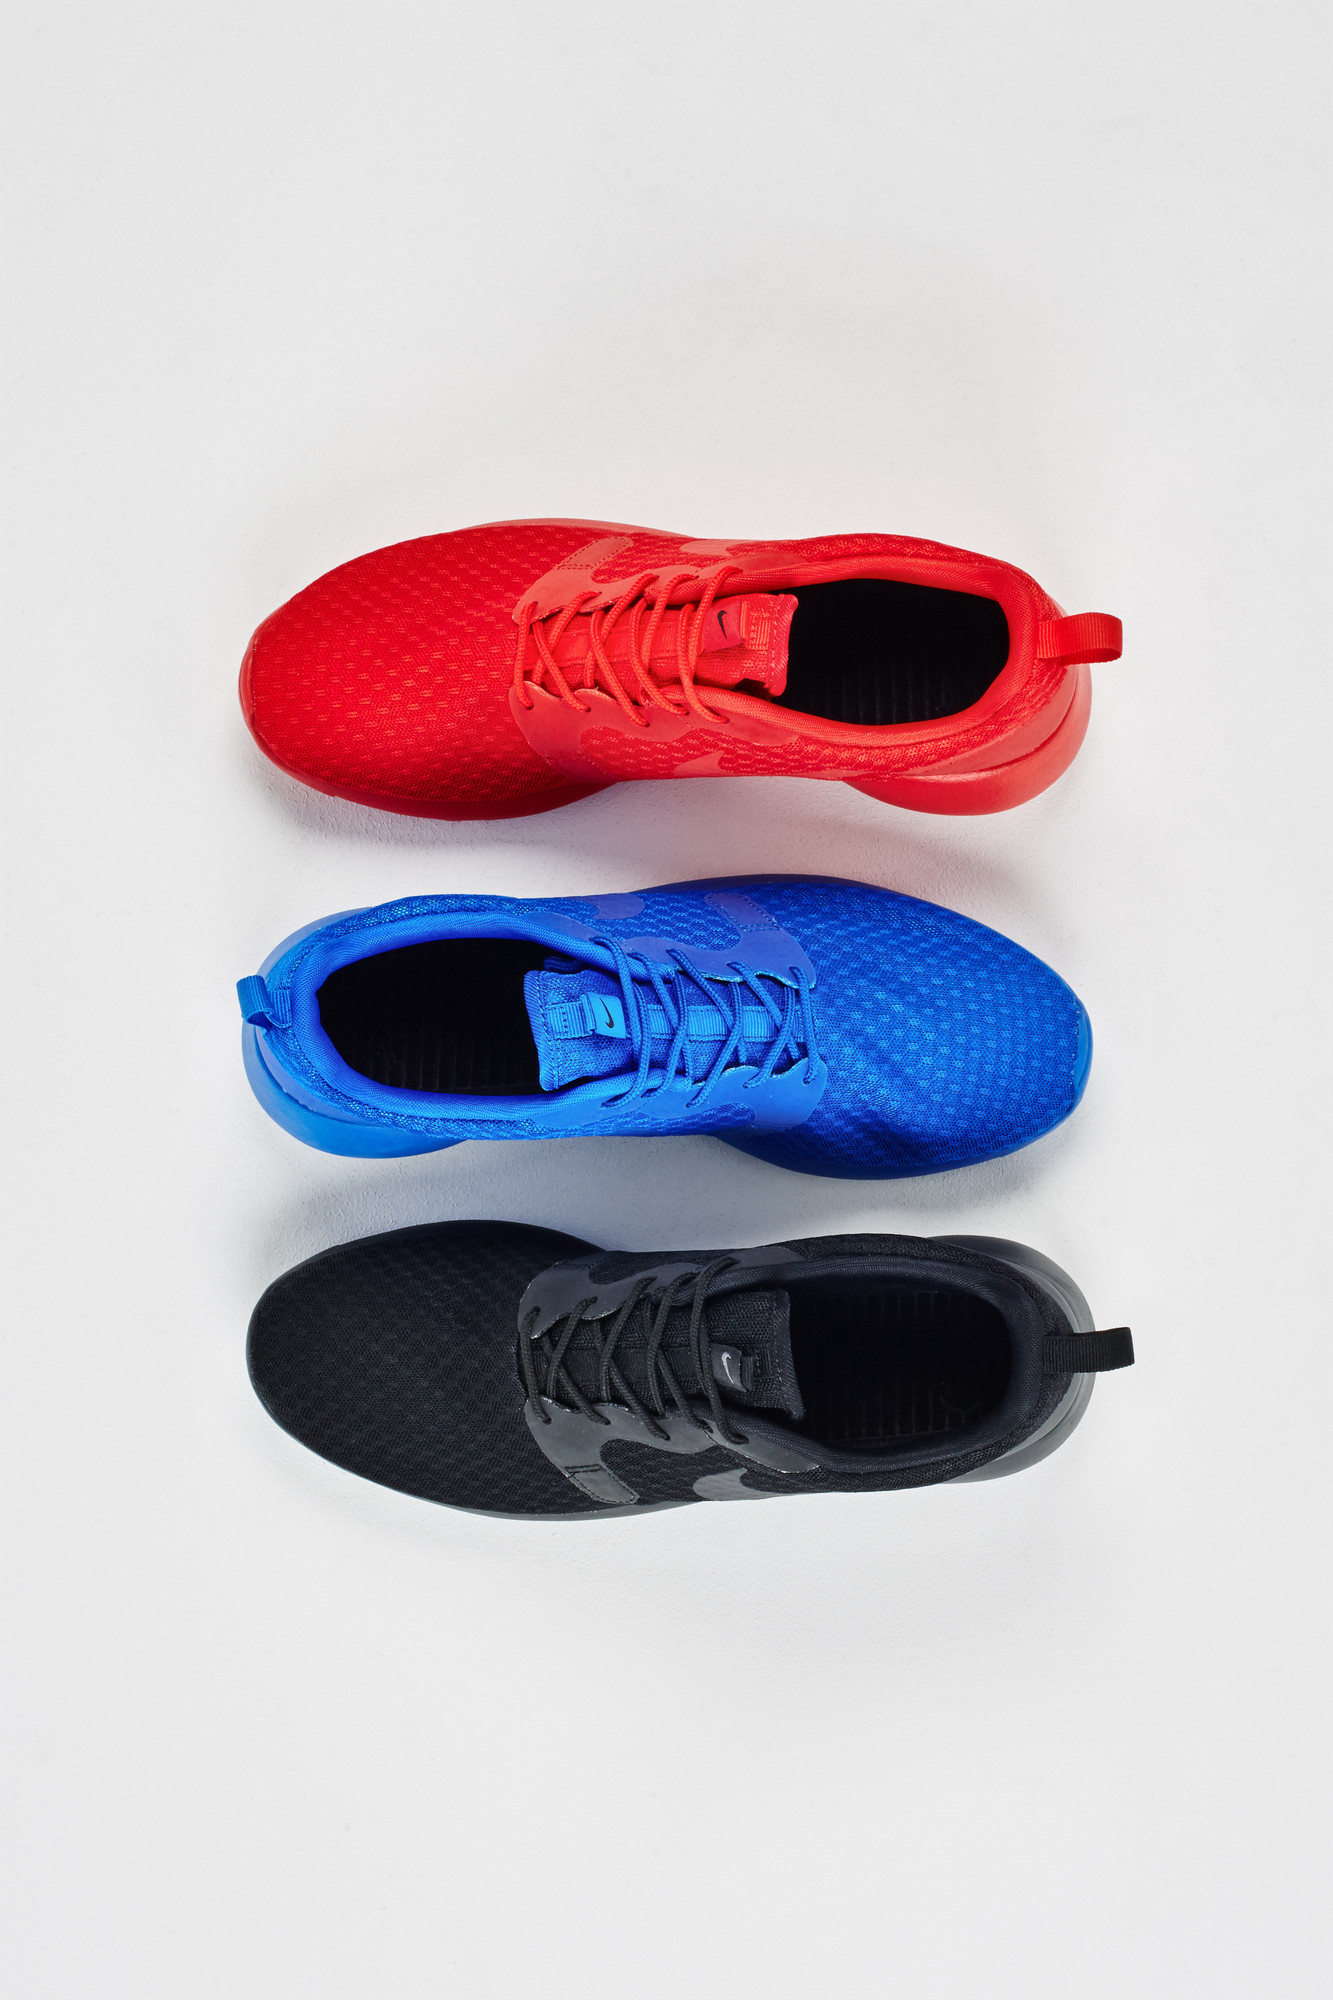 RS106286_Foot Locker x It Must Be February_Nike RosheRun Pack2-lpr